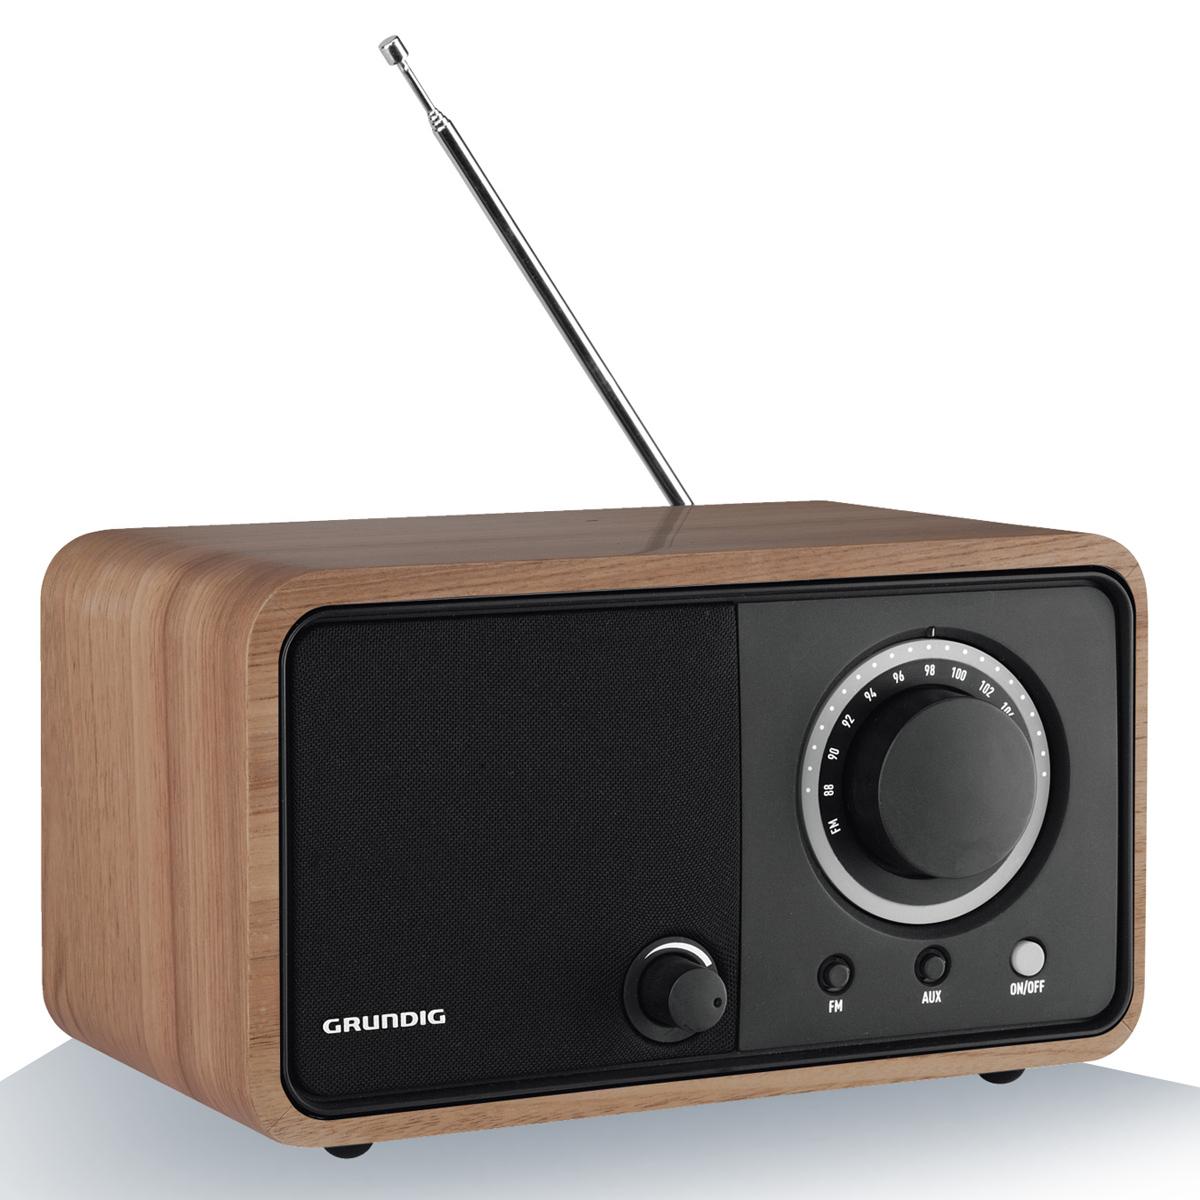 grundig tr 1200 ch ne radio radio r veil grundig sur. Black Bedroom Furniture Sets. Home Design Ideas